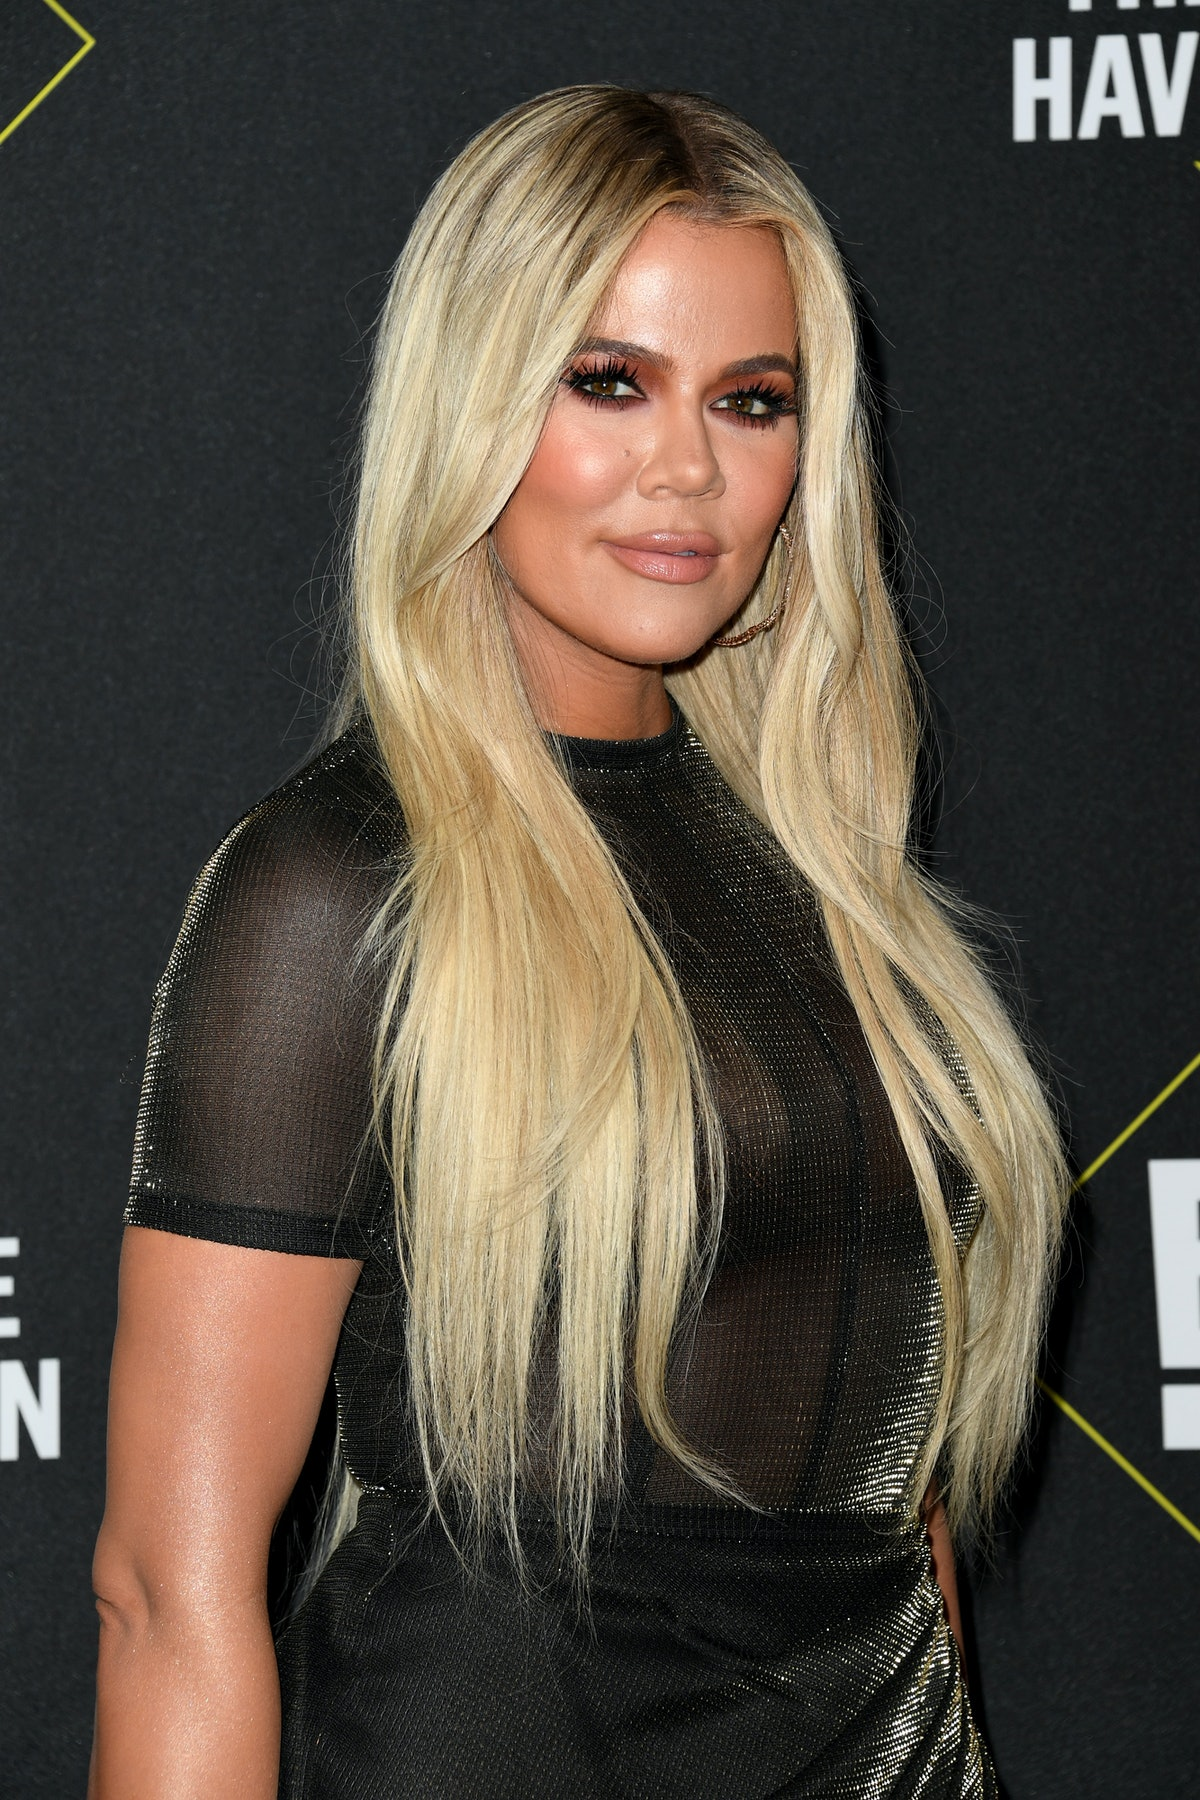 Khloe Kardashian hits the red carpet.